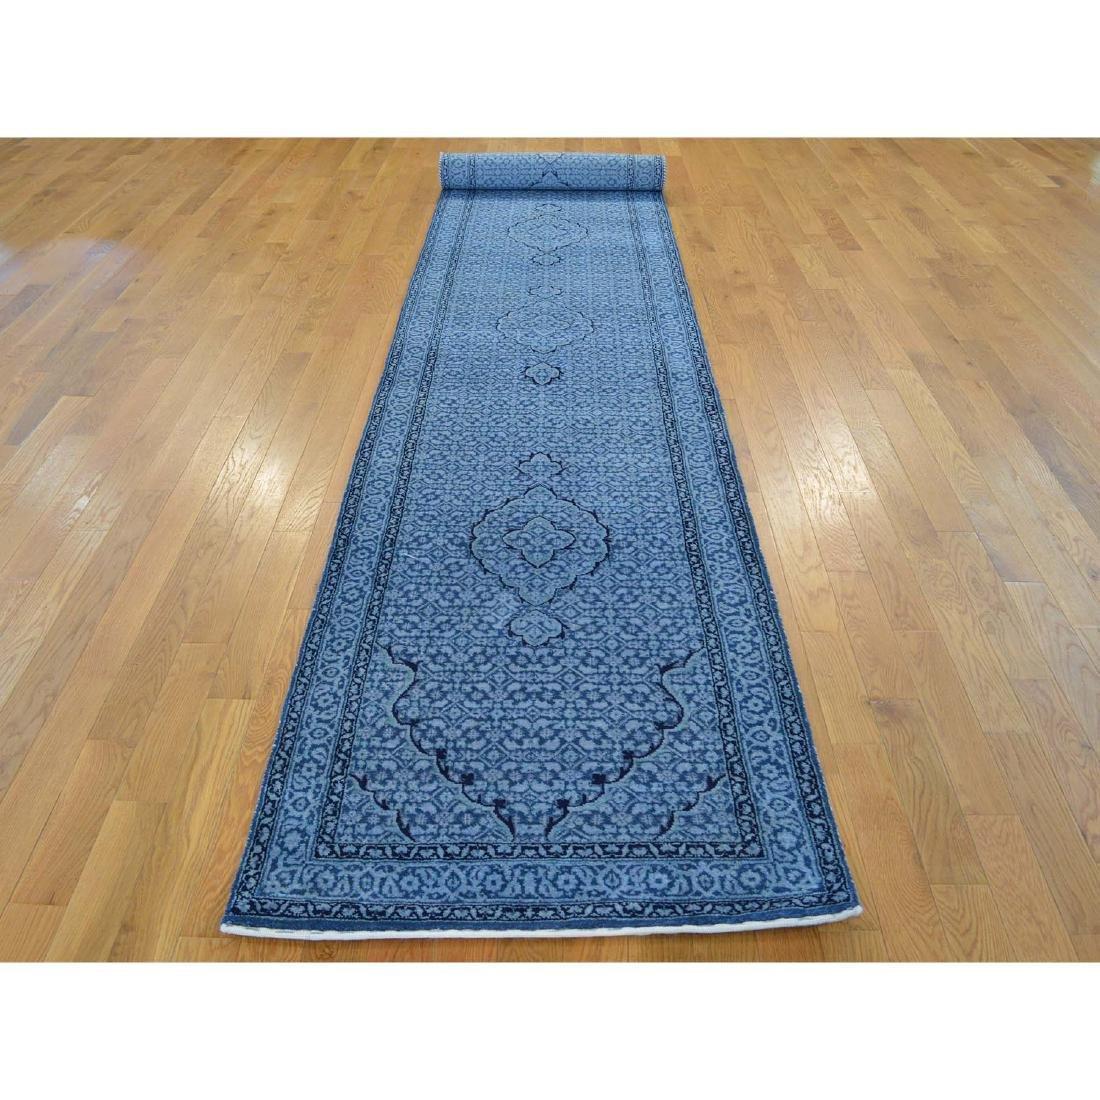 Wool and Silk Tabriz Mahi Runner Oriental Rug Handmade - 2